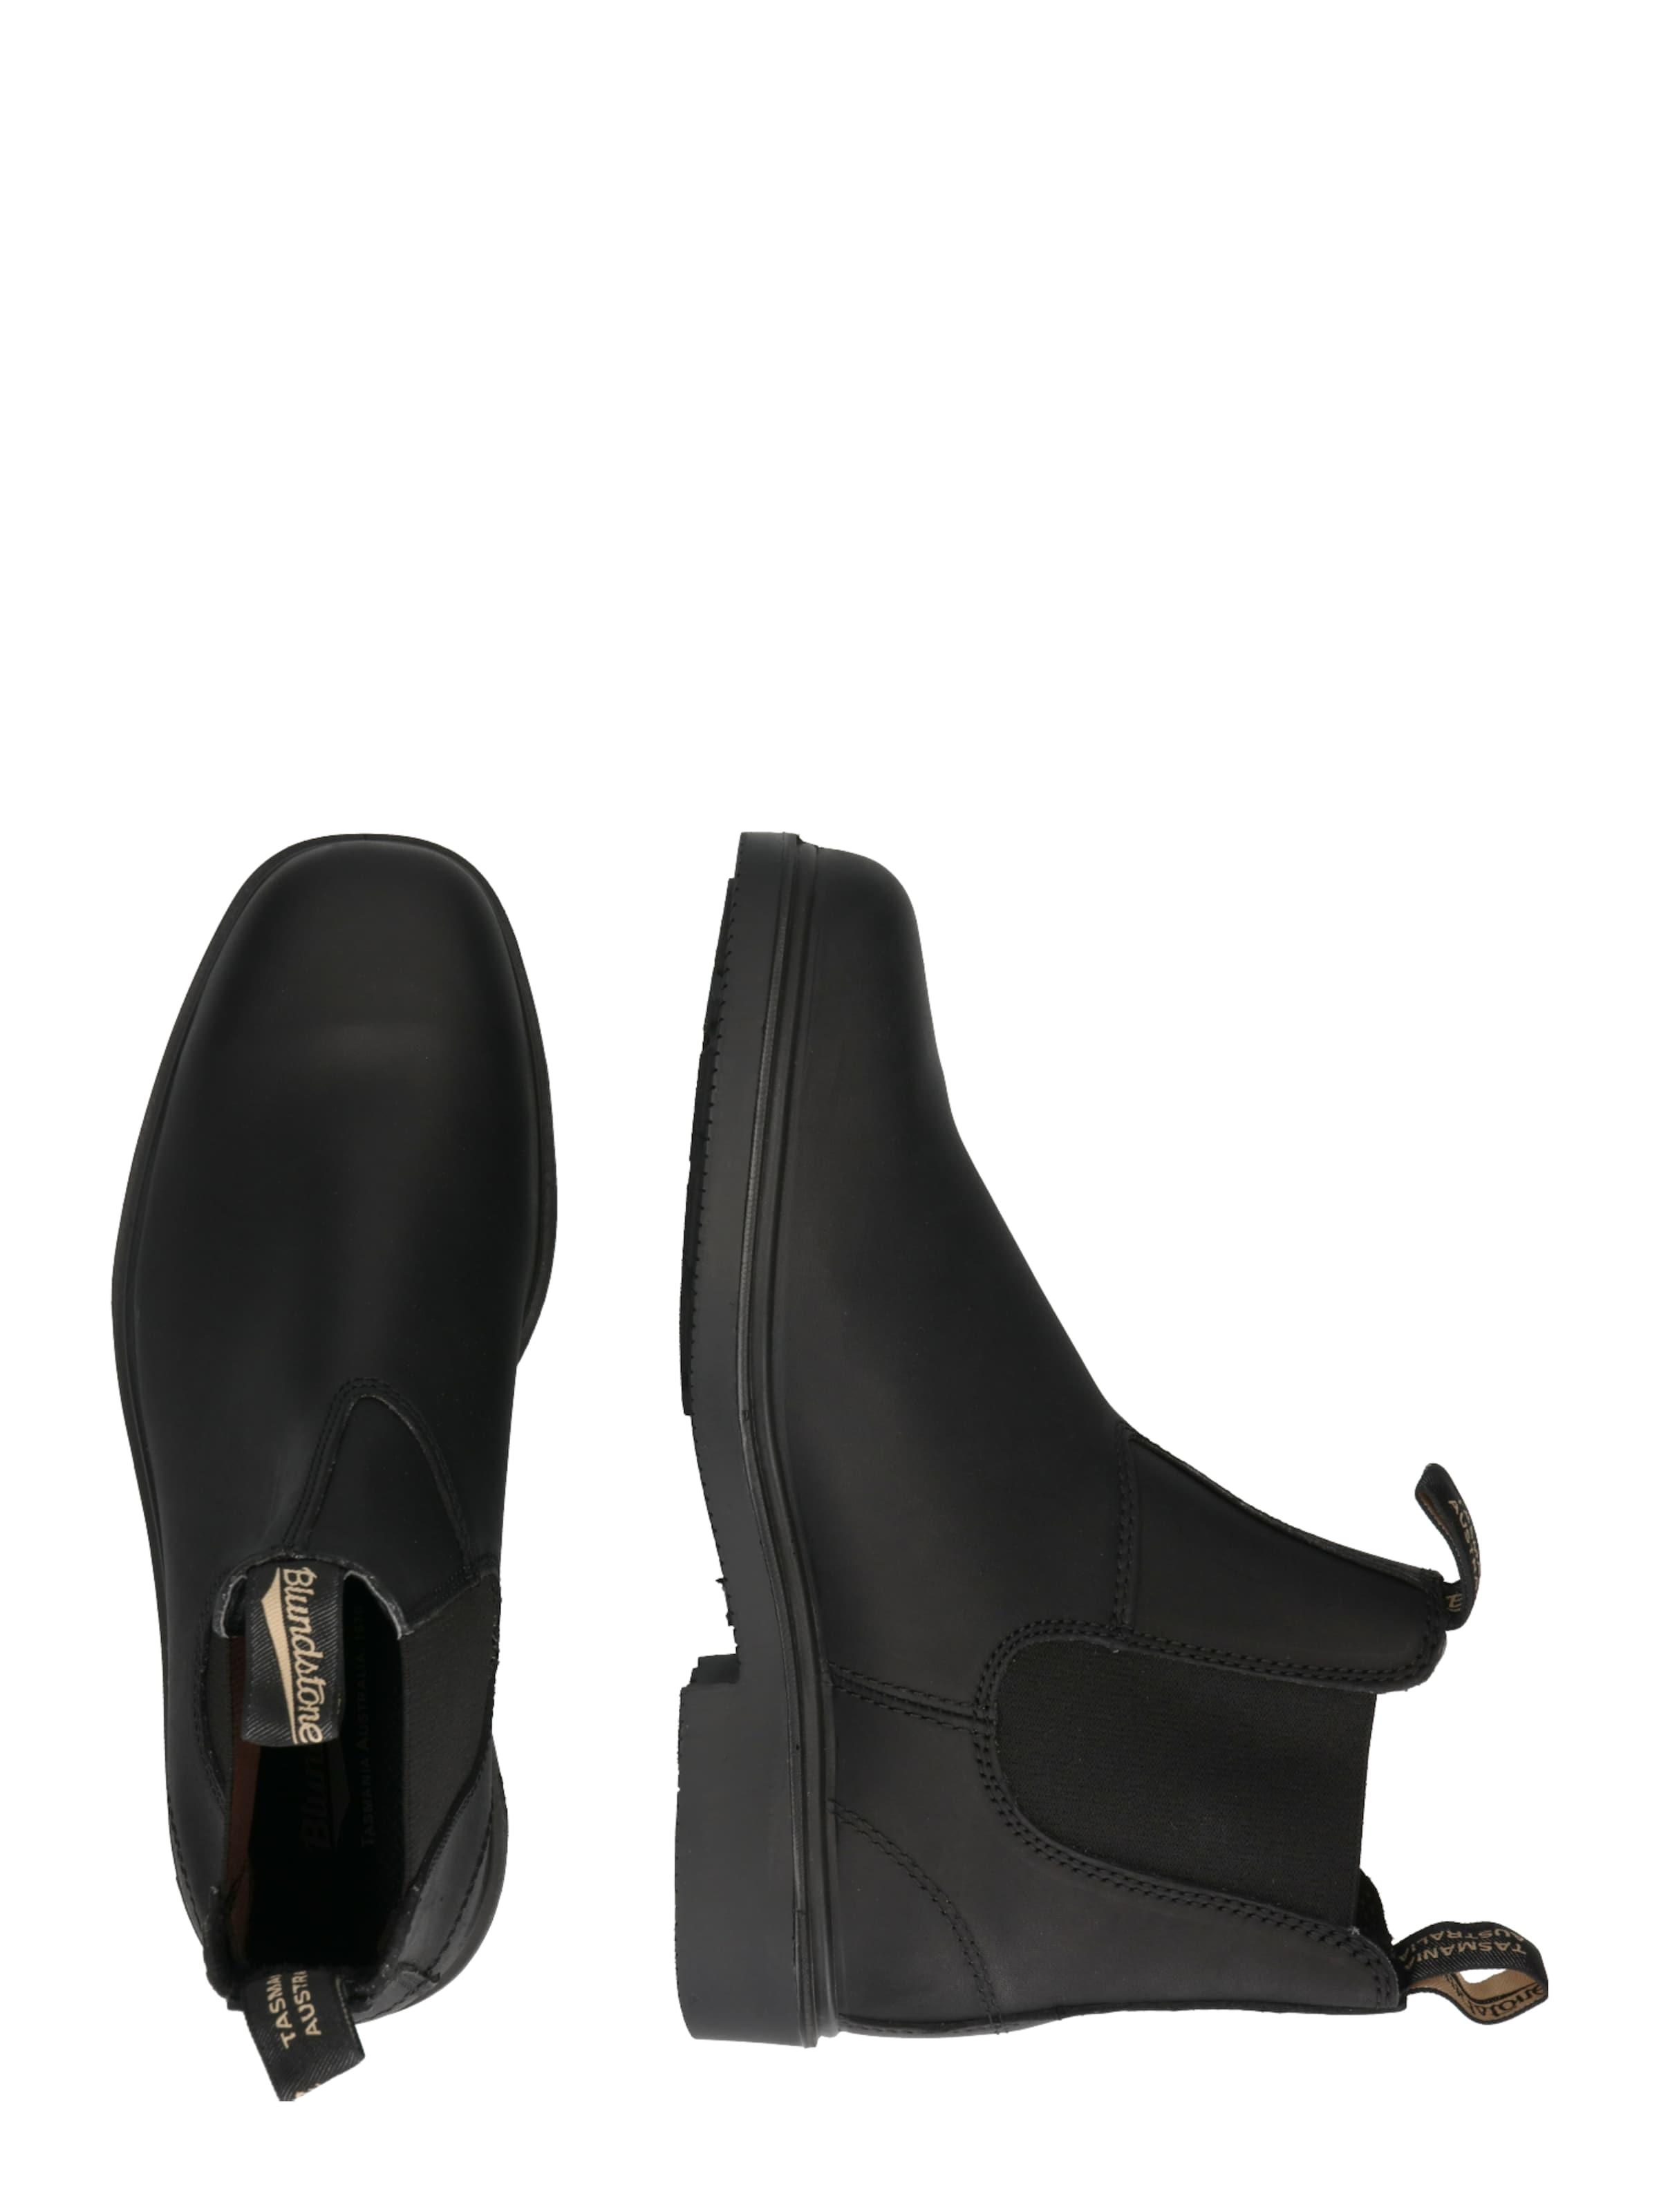 Noir Boots Blundstone Chelsea En '063' trdxhQCs